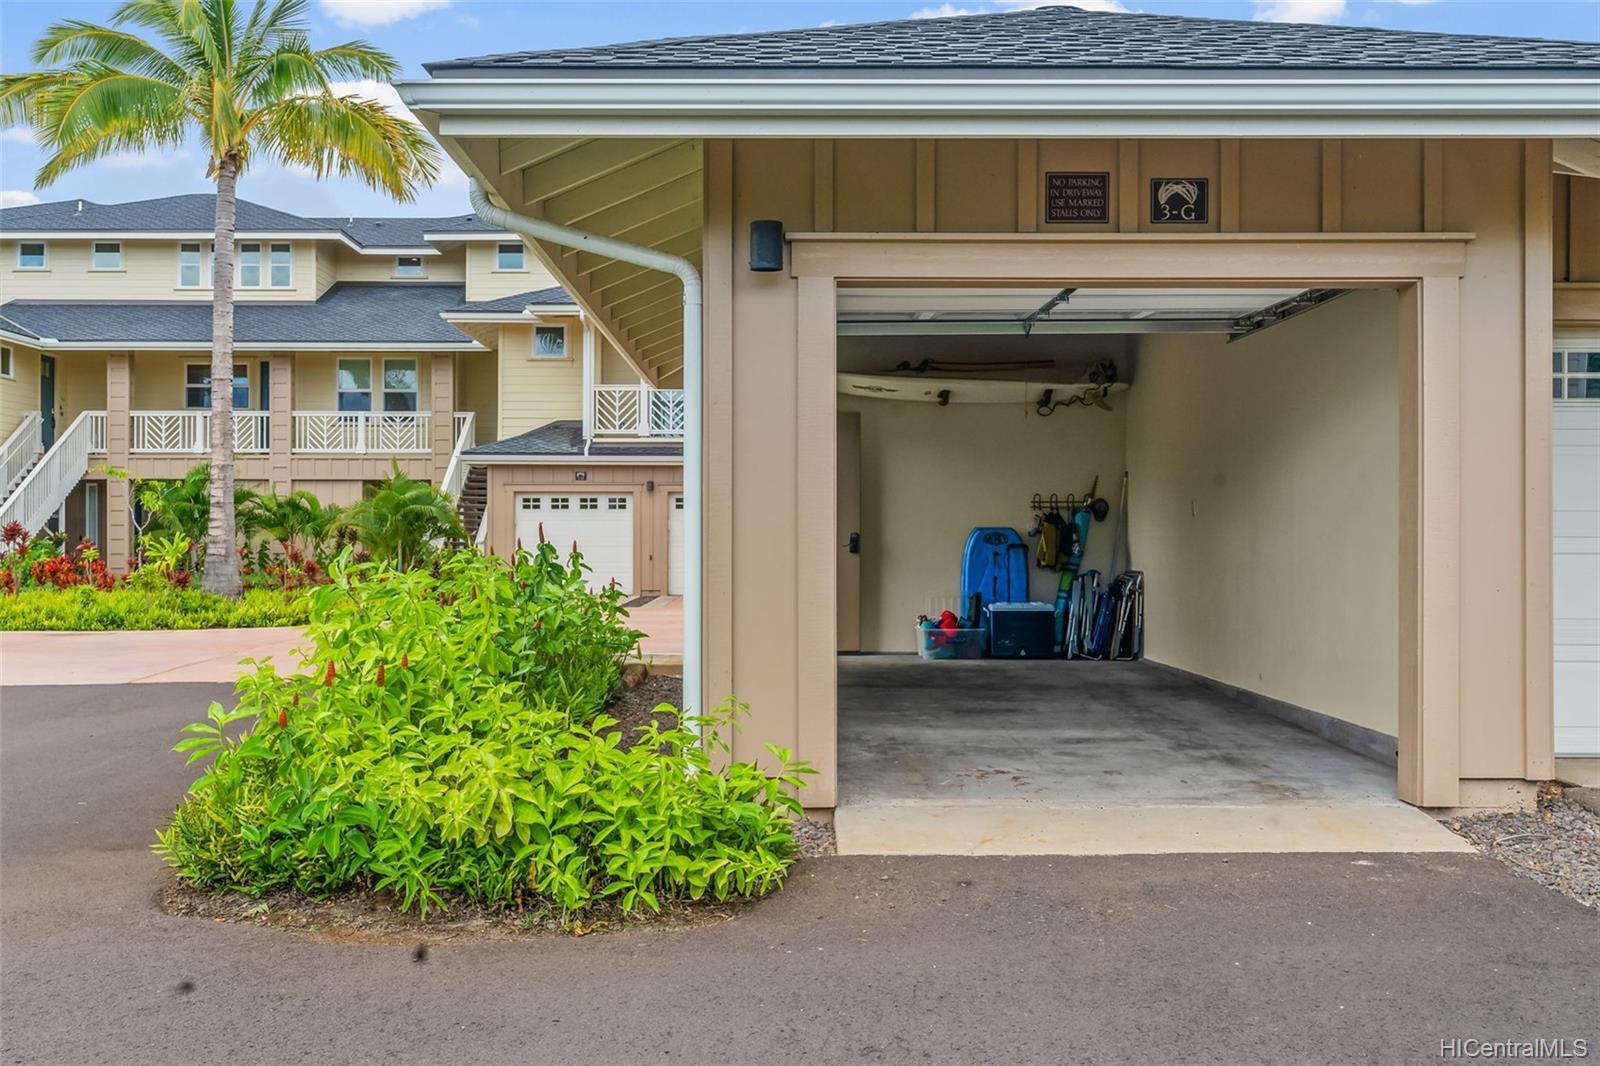 2611 Kiahuna Plantation Drive townhouse # 3G, Koloa, Hawaii - photo 15 of 25